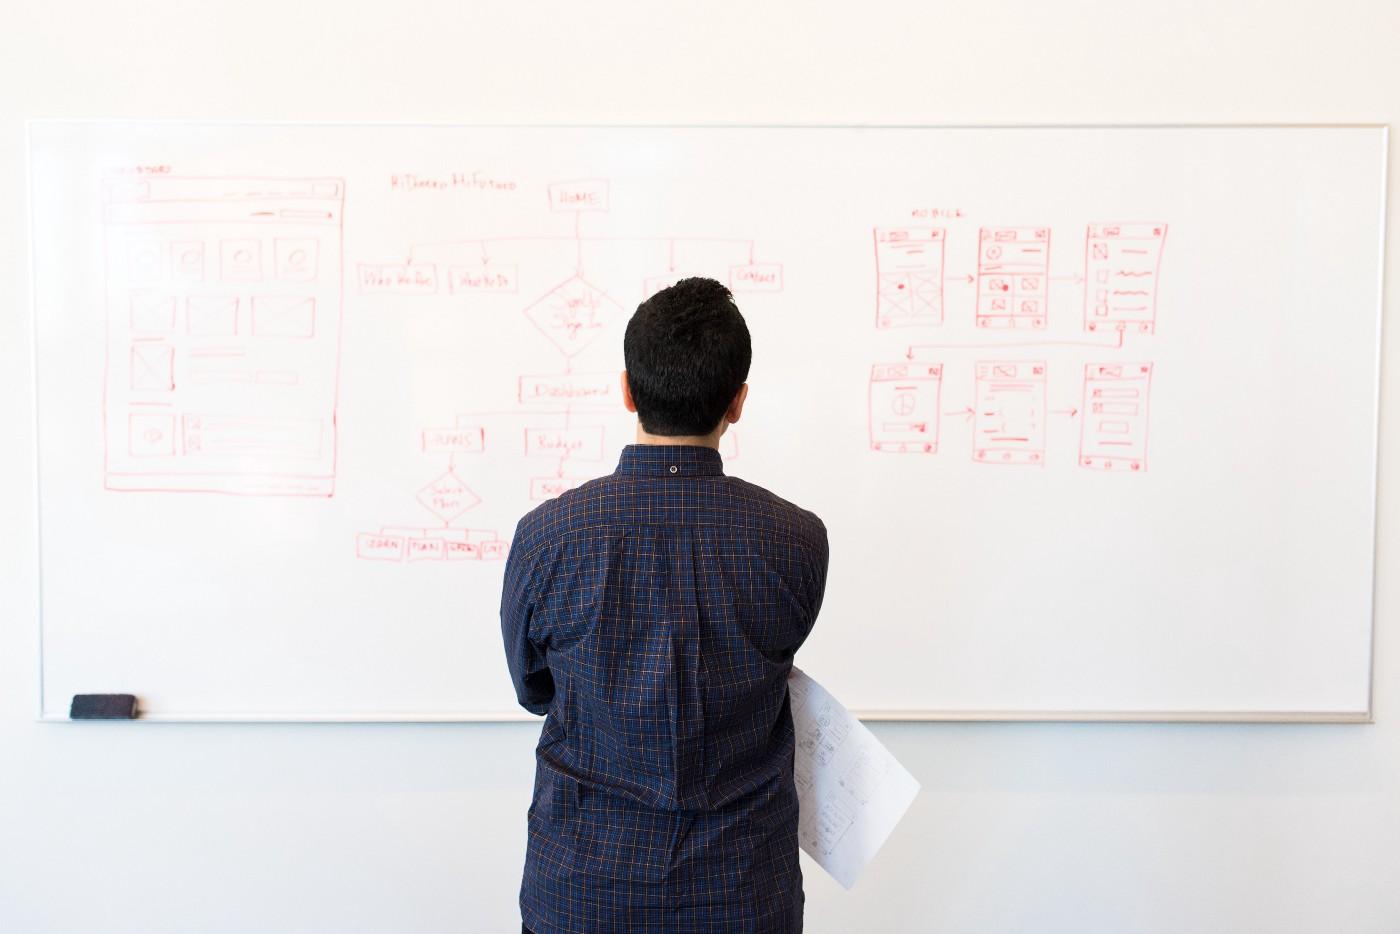 Data-Driven Decisions for Accelerators and Incubators